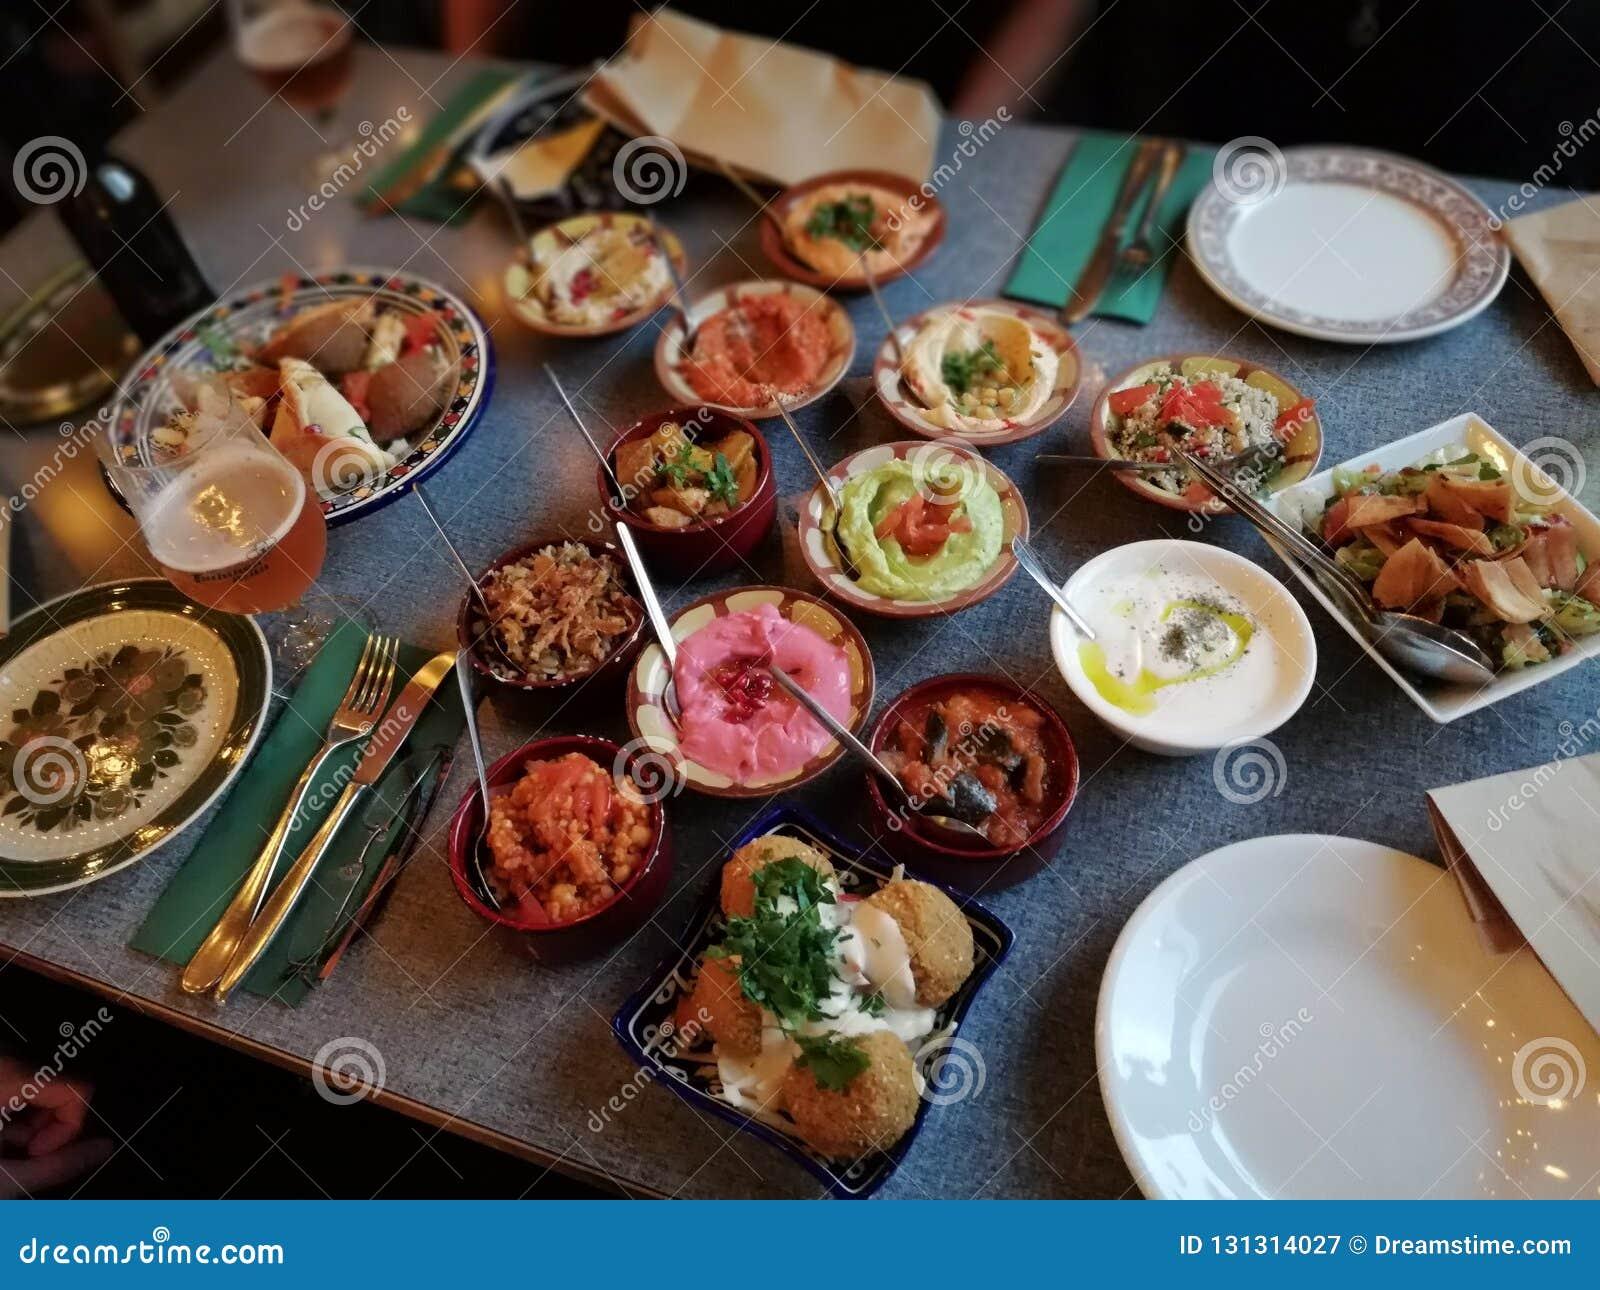 Middle eastern mezze dinner